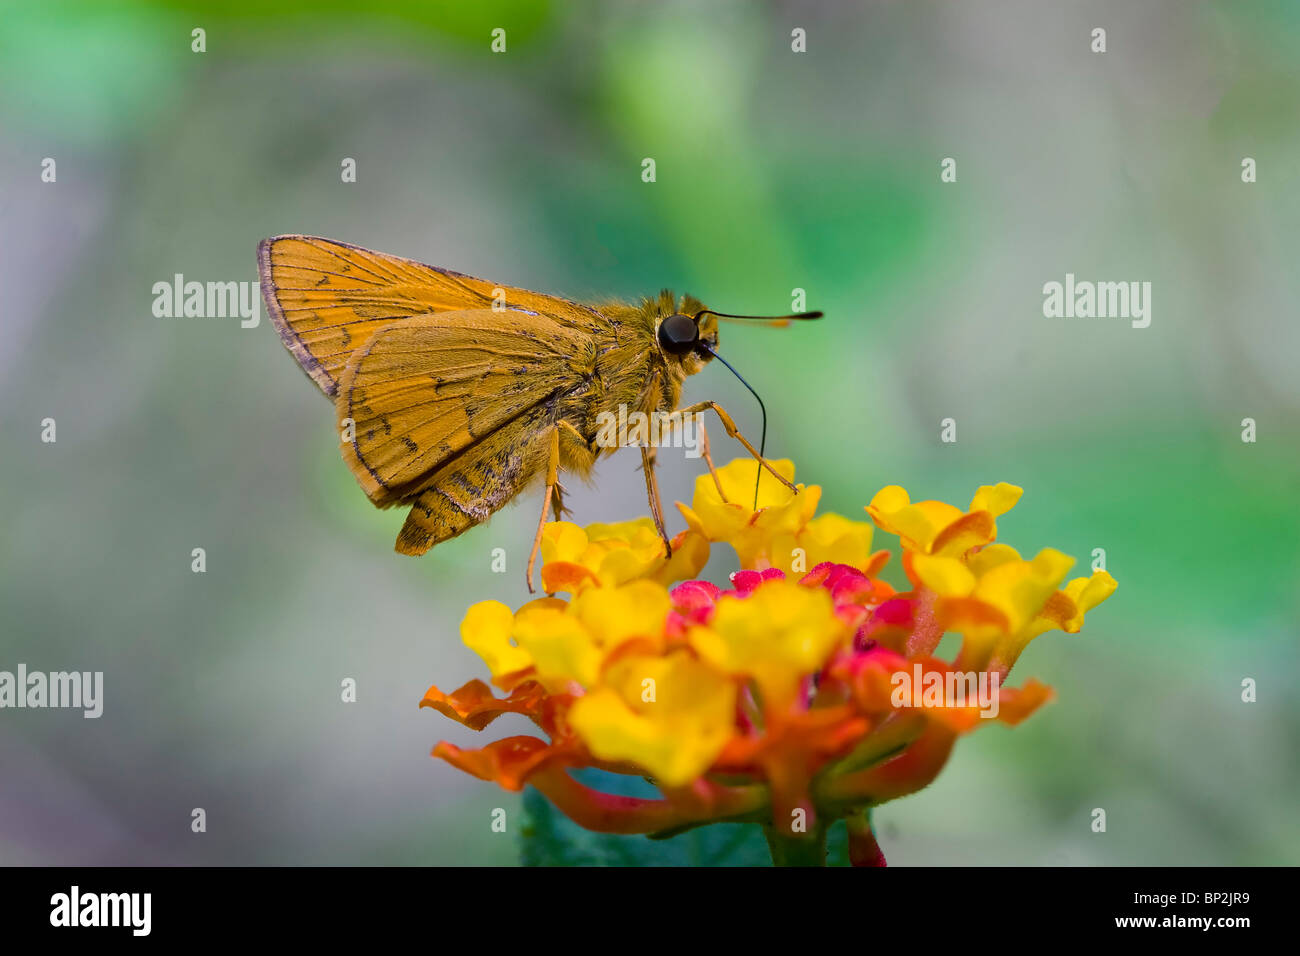 Nectar hunter, feeding, sucking,licking, butterfly,moth, awl, banded, lantana, flower,proboscis,india,wildlife,photography,macro - Stock Image